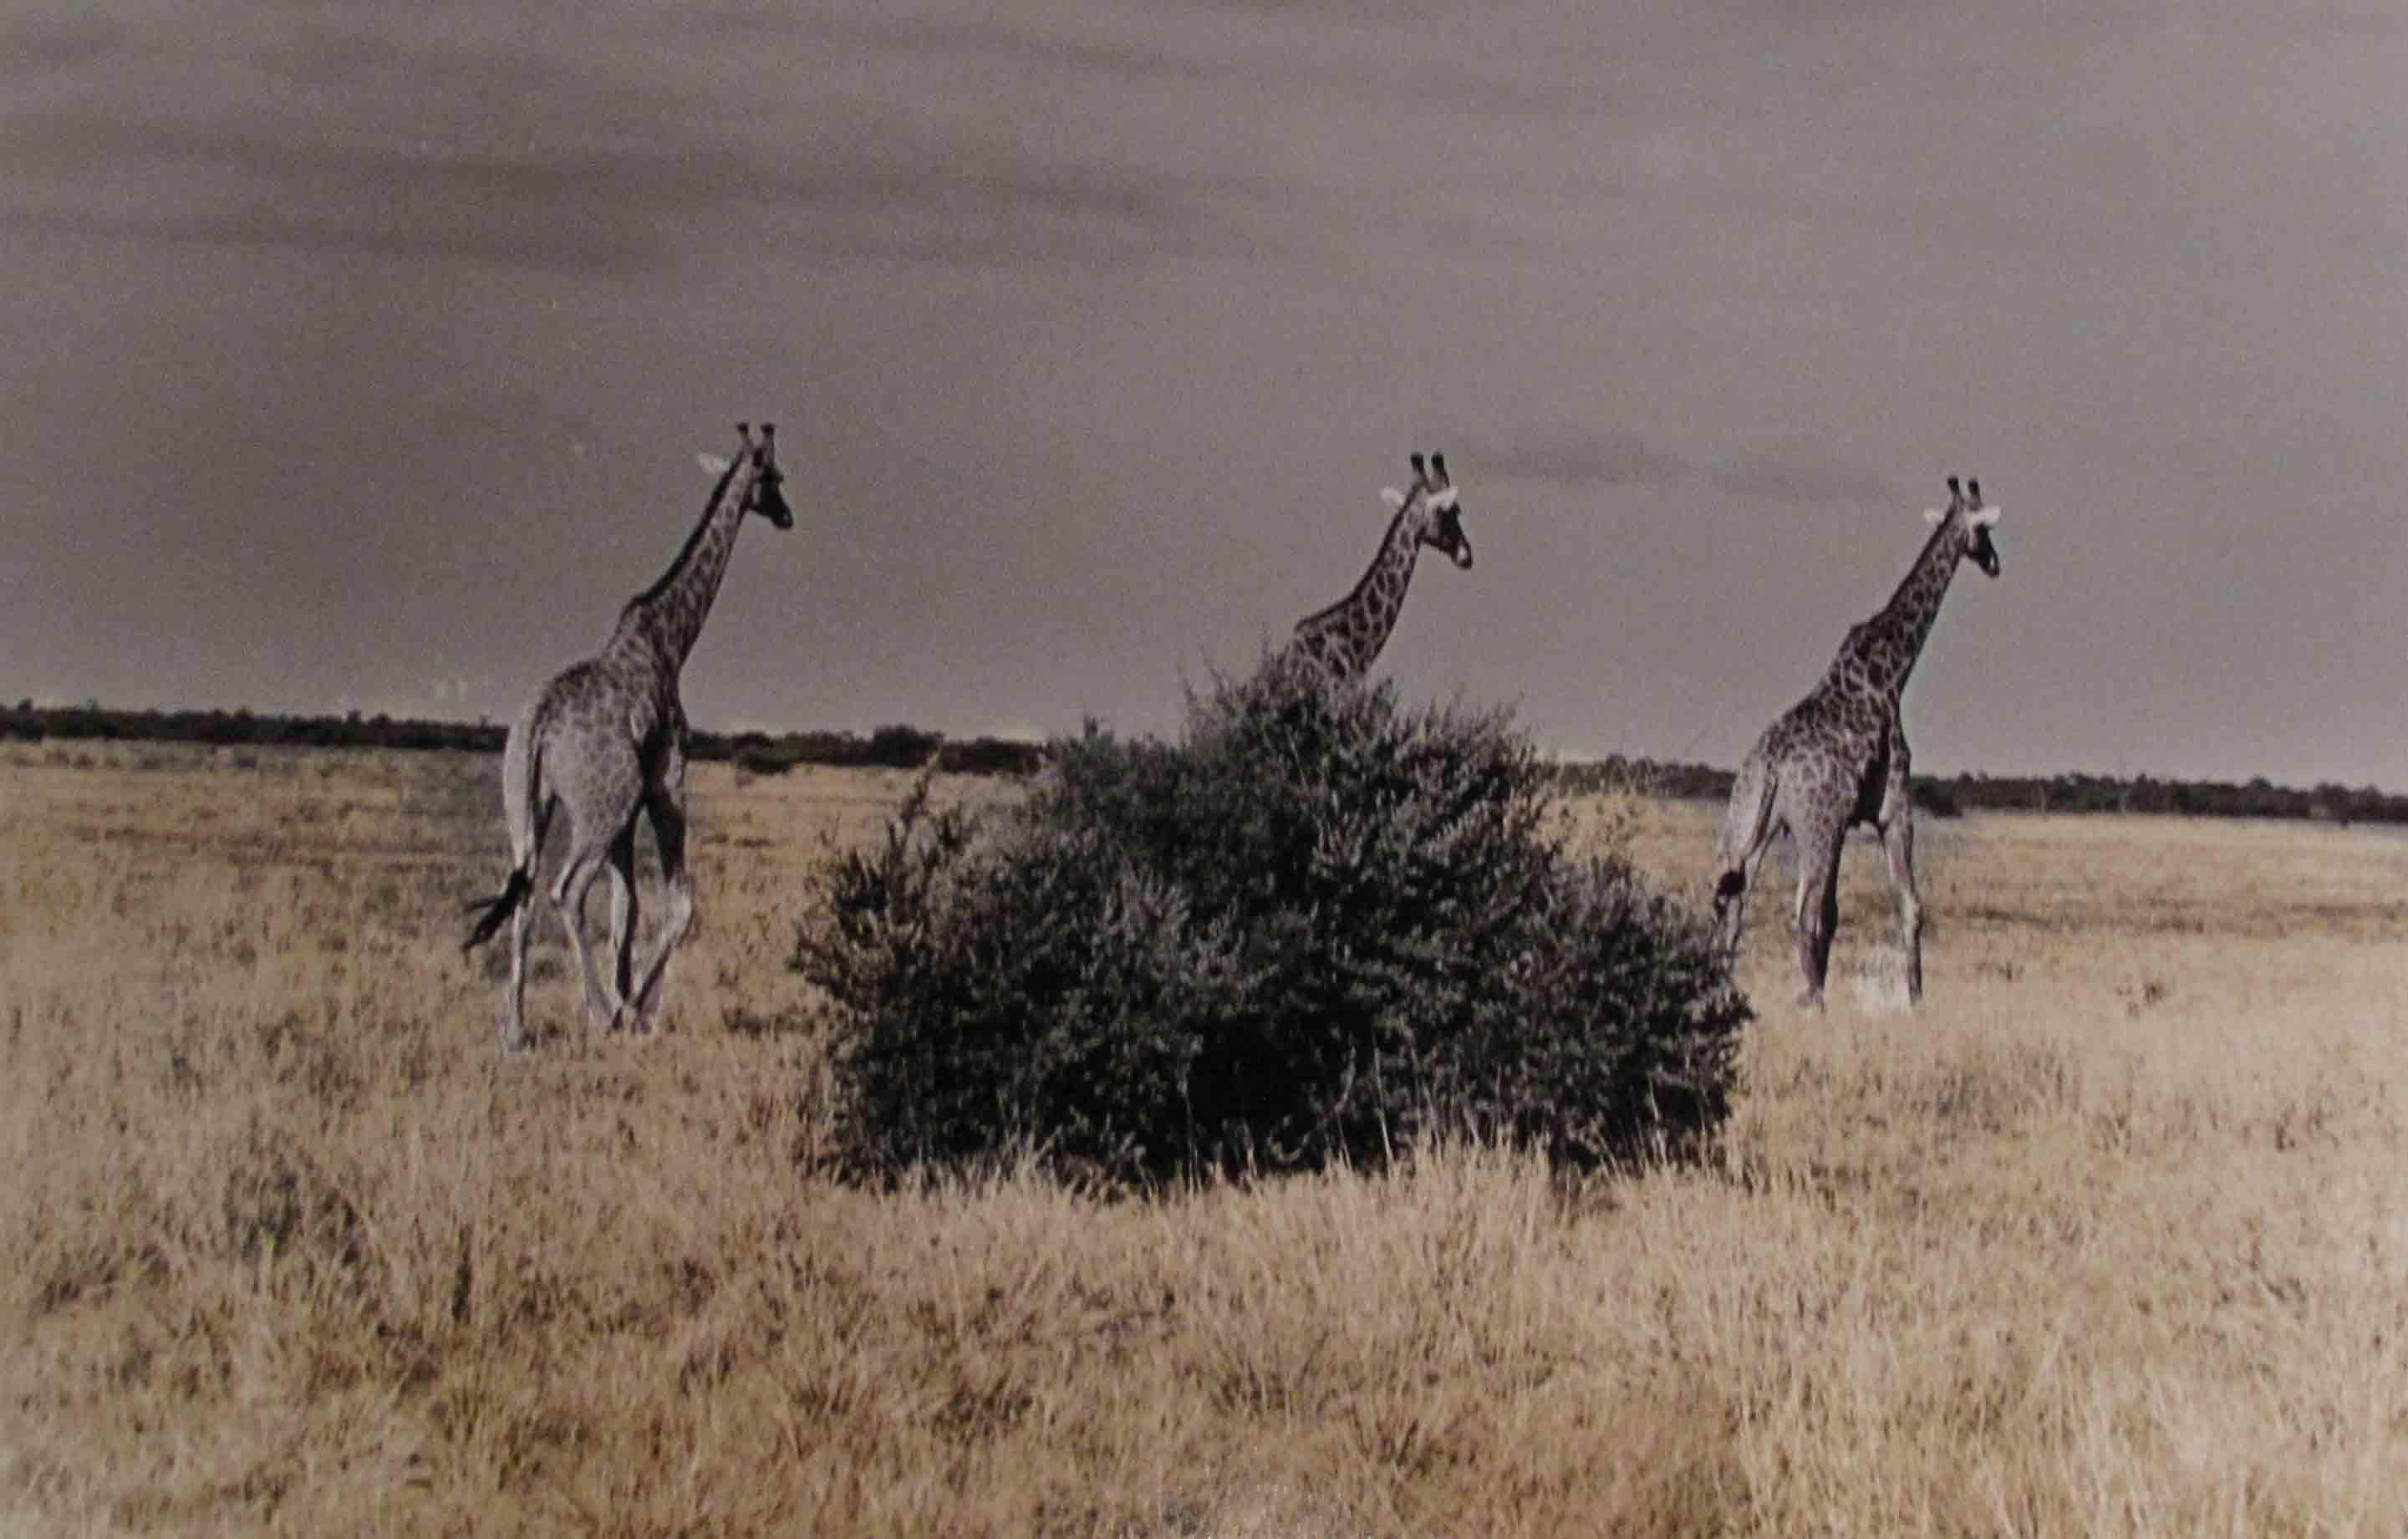 Botswana, 2009<br/>Impresión de tintas de pigmentos / Inkjet